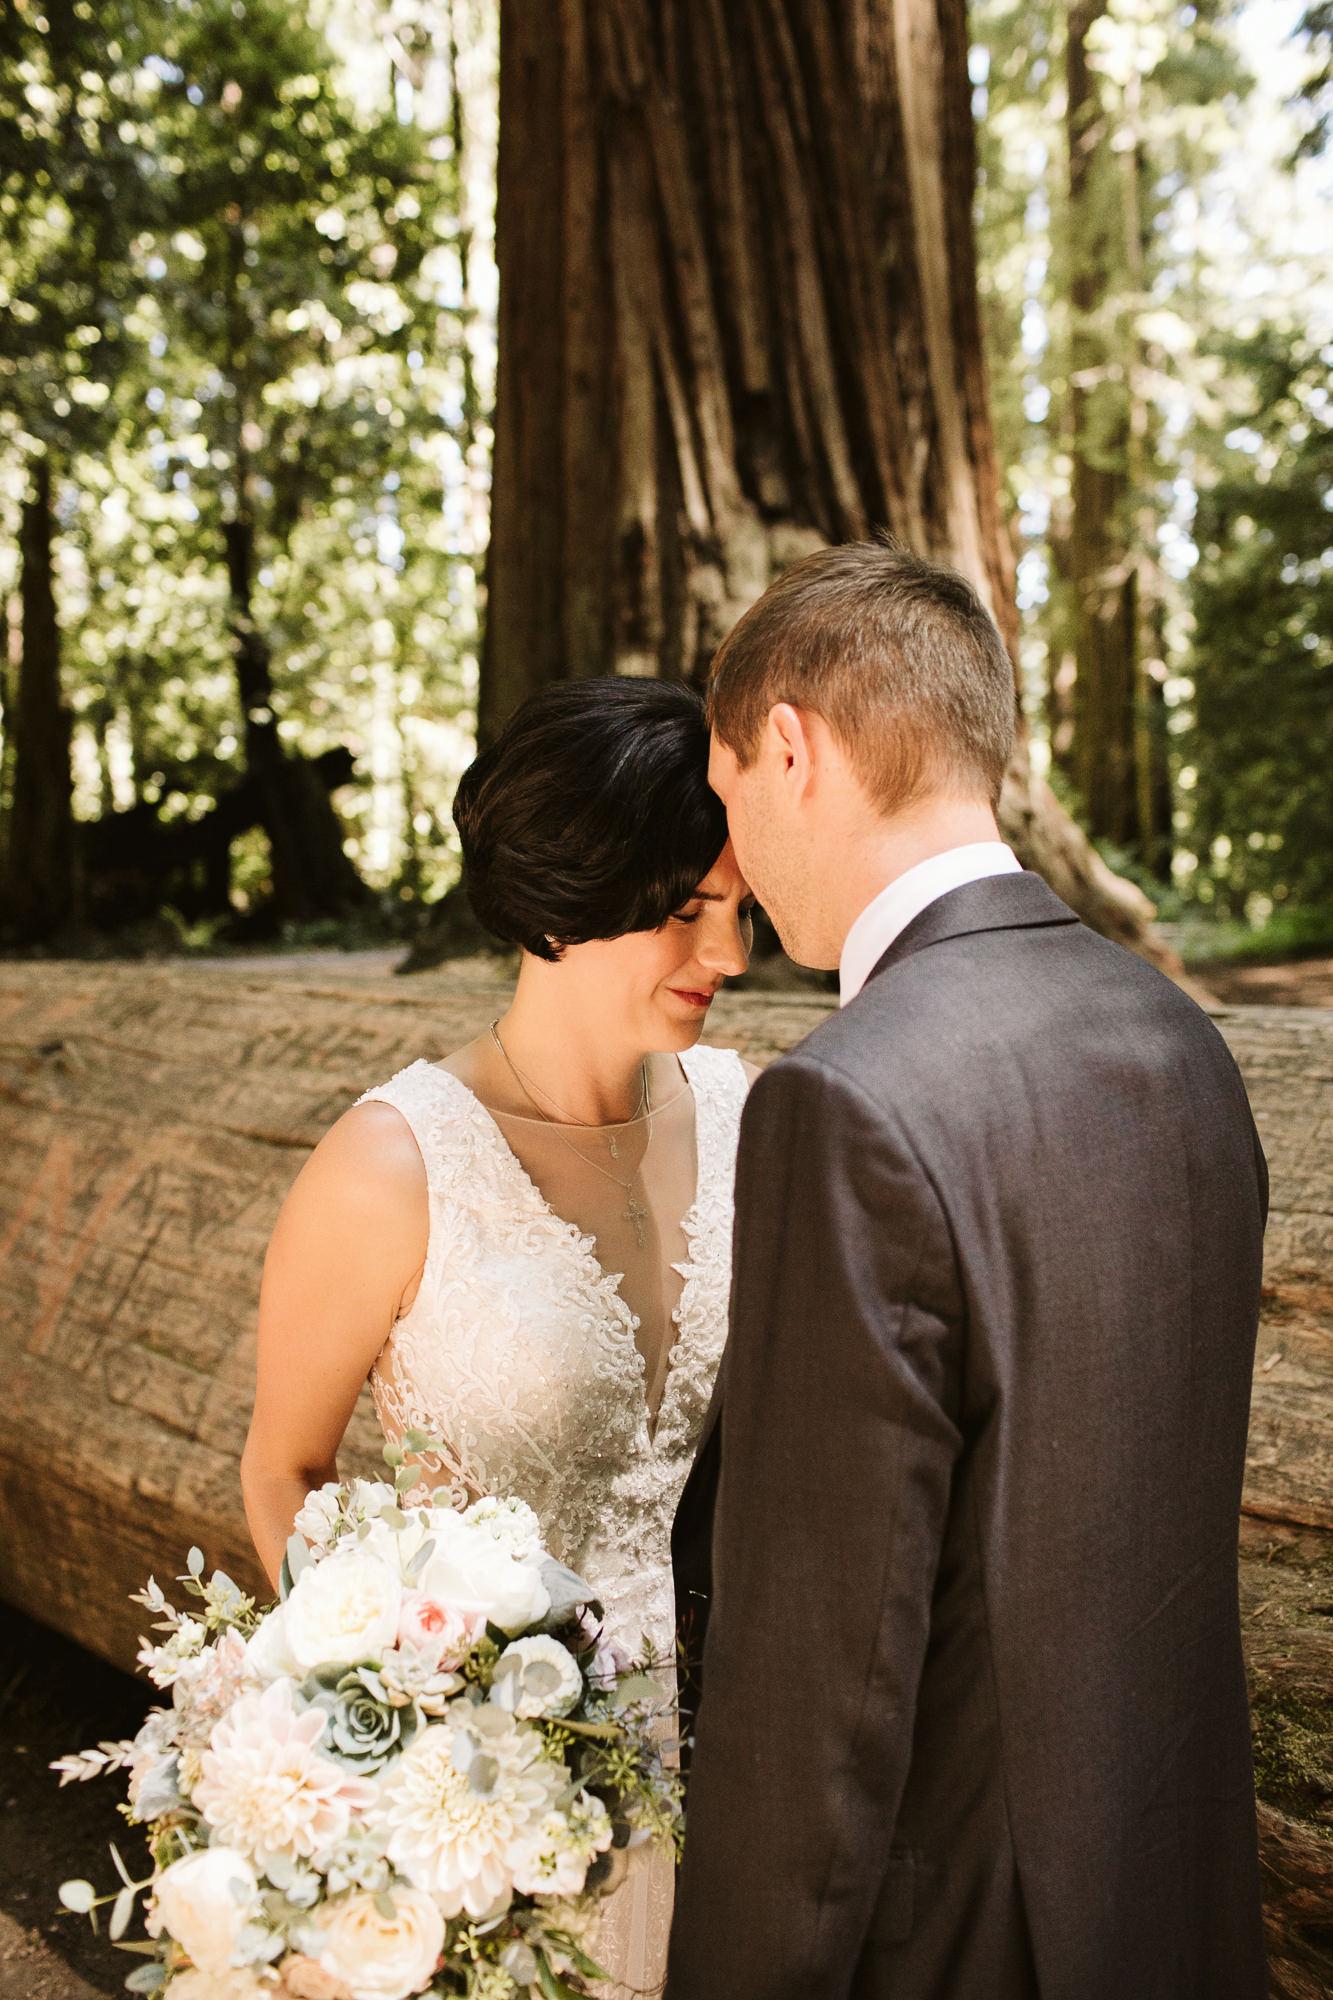 California-wedding-photographer-alfonso-flores-pamplin-groove-158.jpg